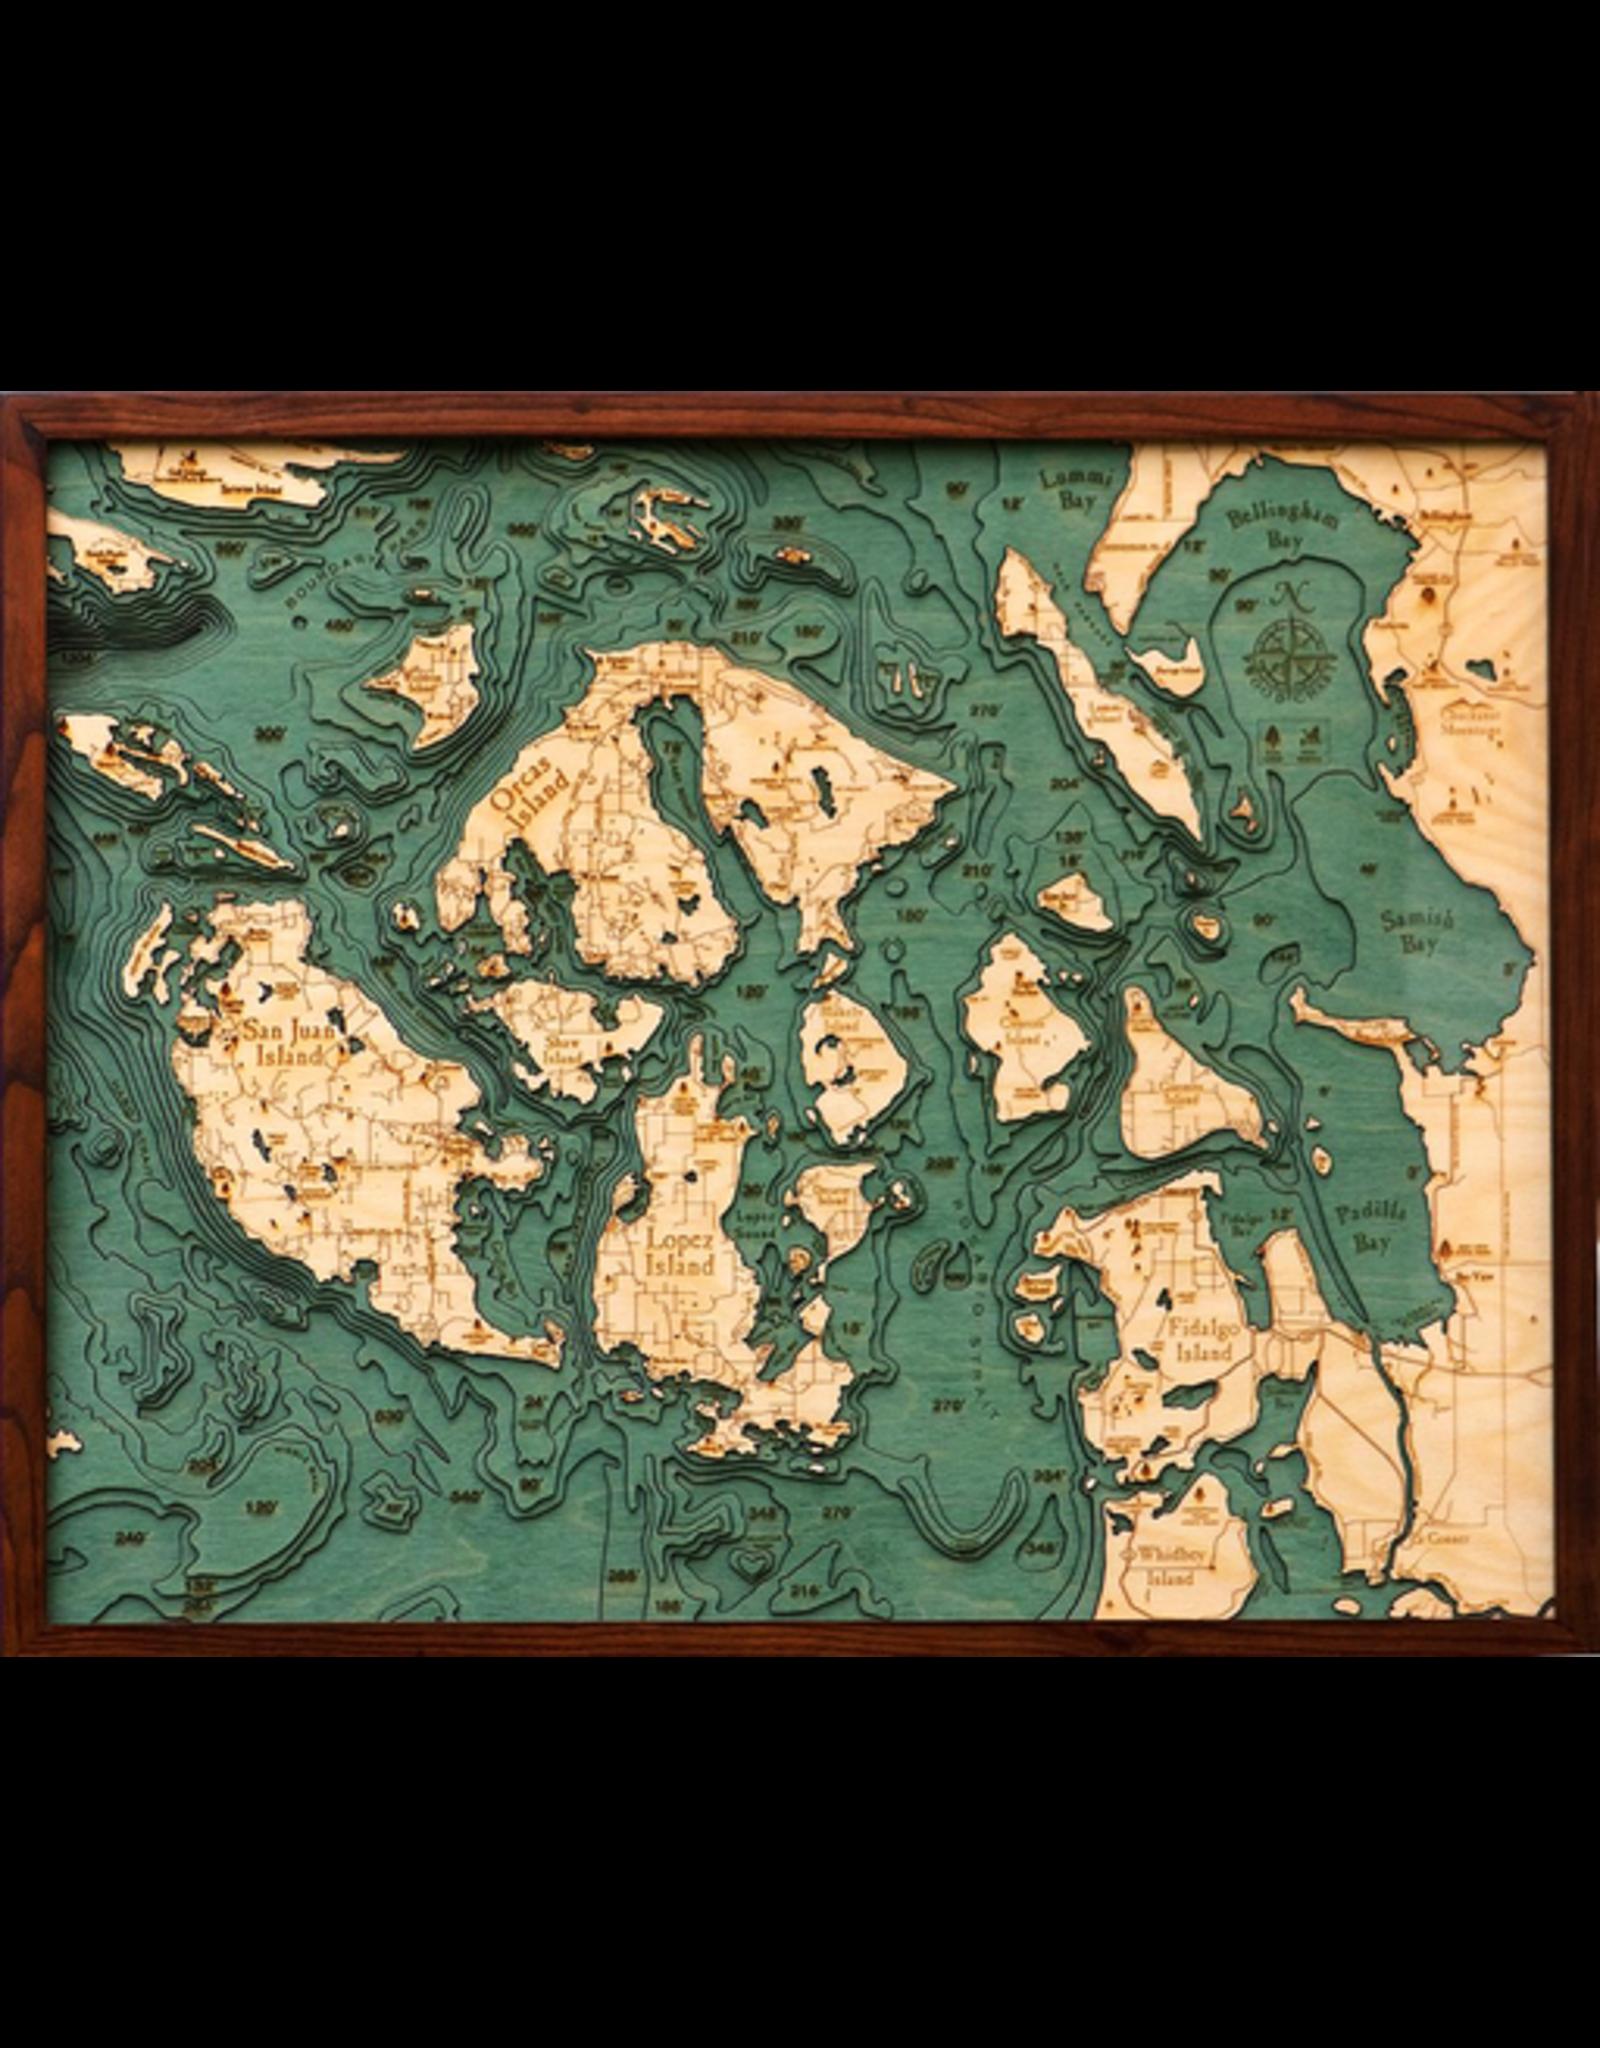 WoodCharts San Juan Islands (Bathymetric 3-D Wood Carved Nautical Chart)